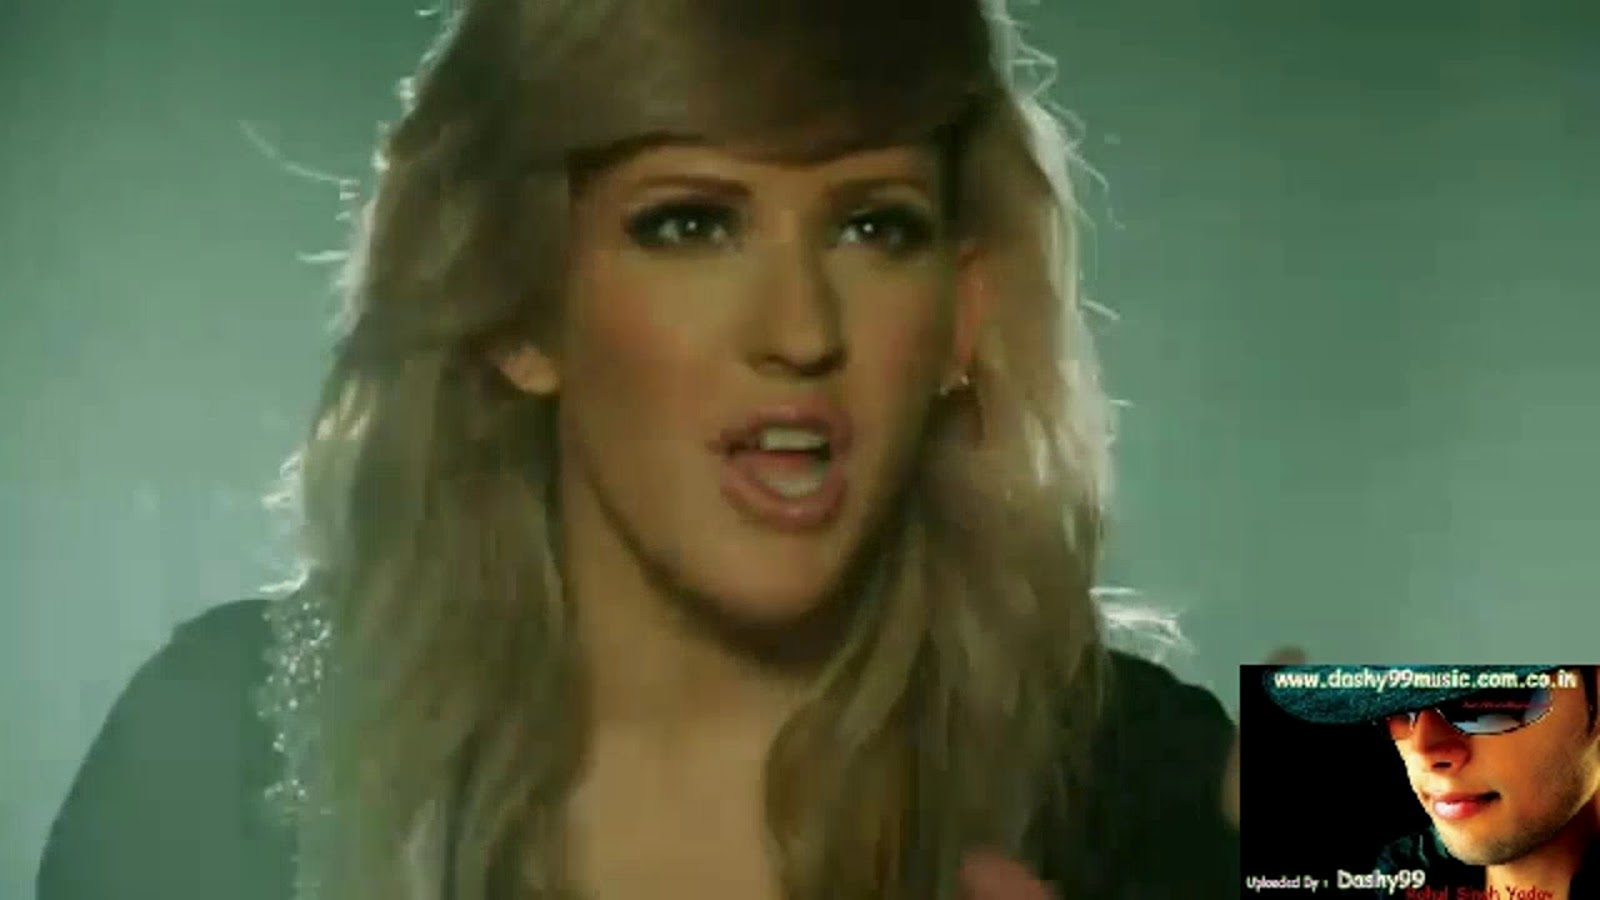 Шакира вака вака, Shakira - Waka Waka (FifaWorld Cup) - скачать 4 фотография